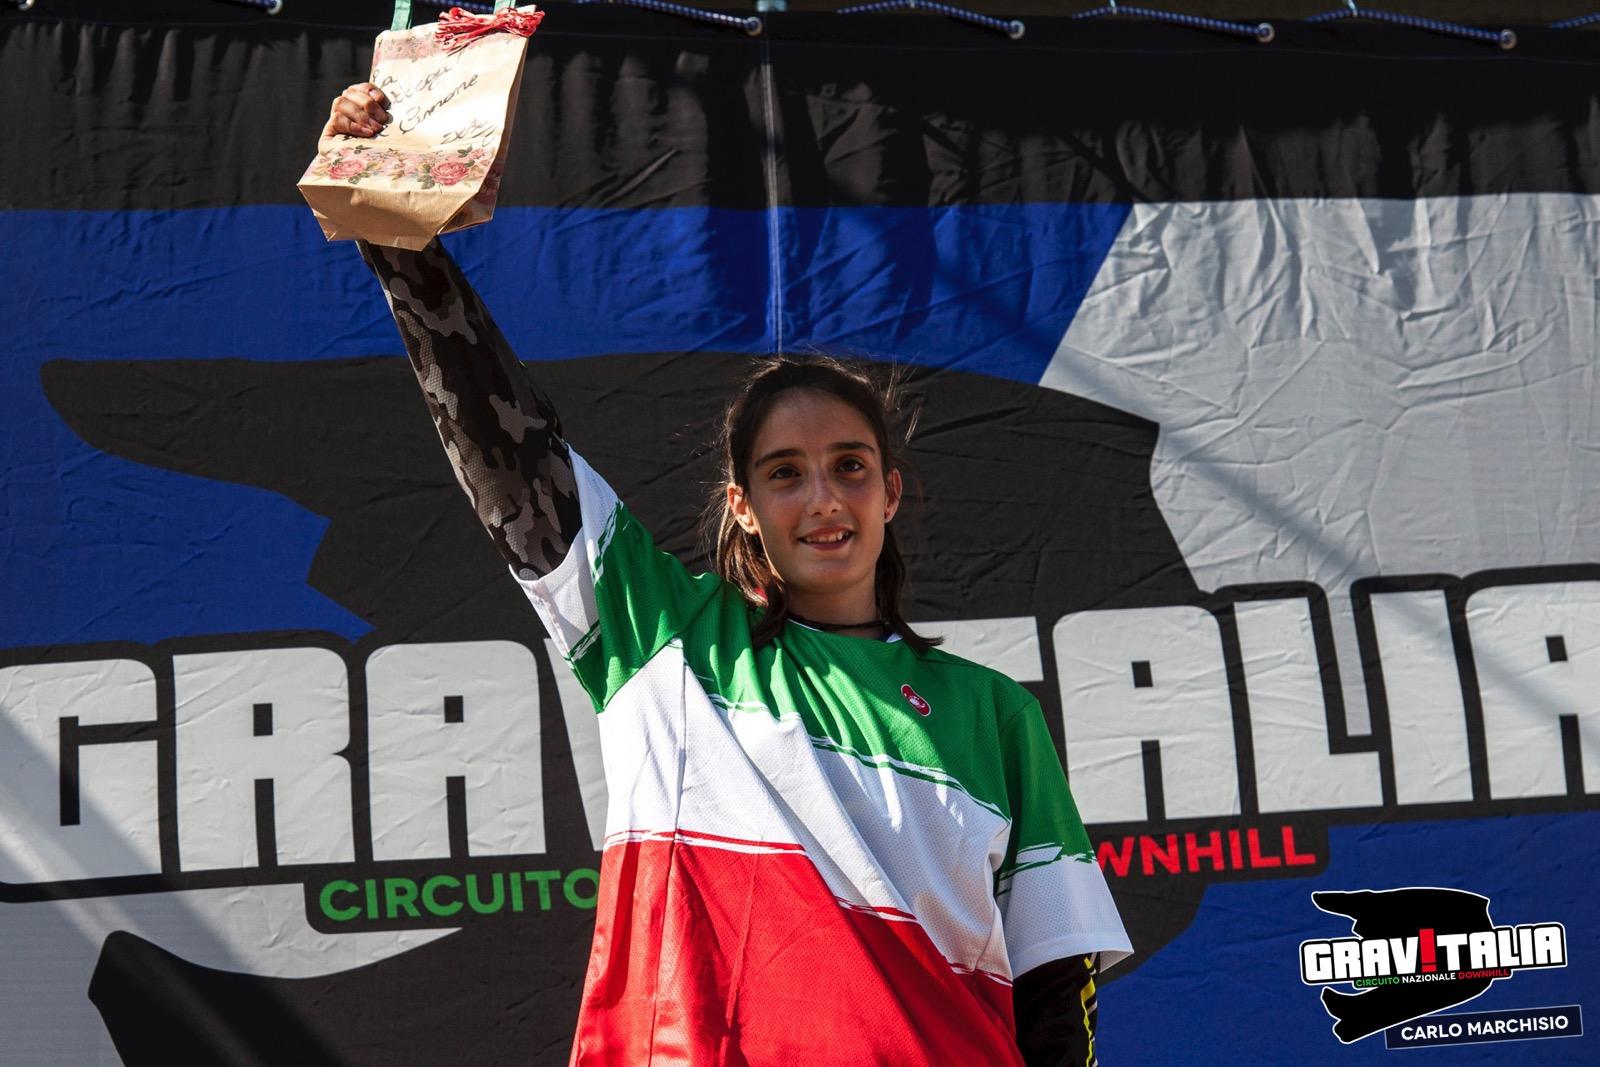 PhotoCarloMarchisio_GIT2015_CampionatiItaliani_Sestola_075